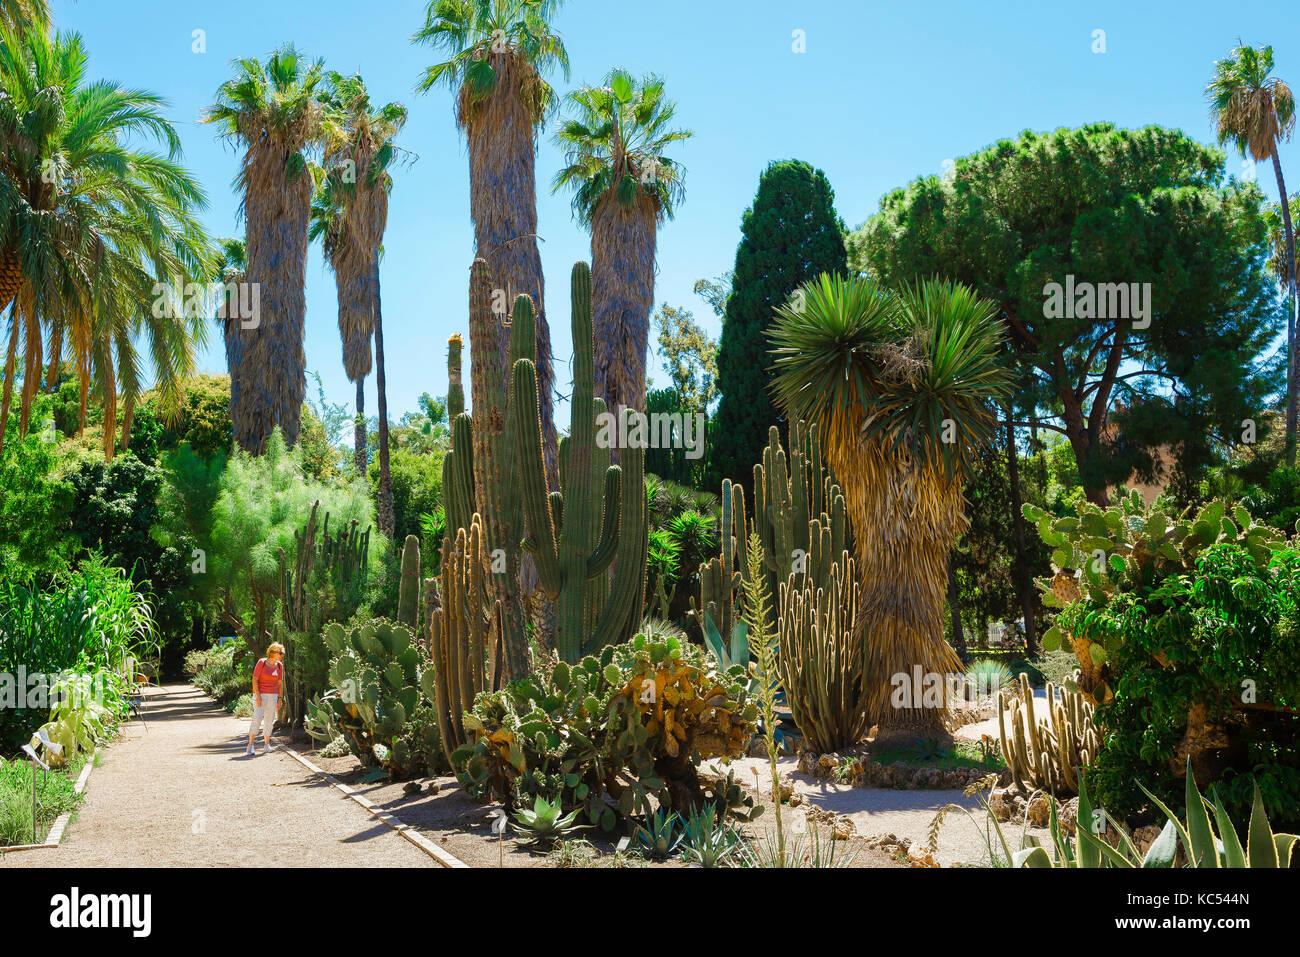 Cactus valencia spain stock photos cactus valencia spain - Jardin botanico valencia ...